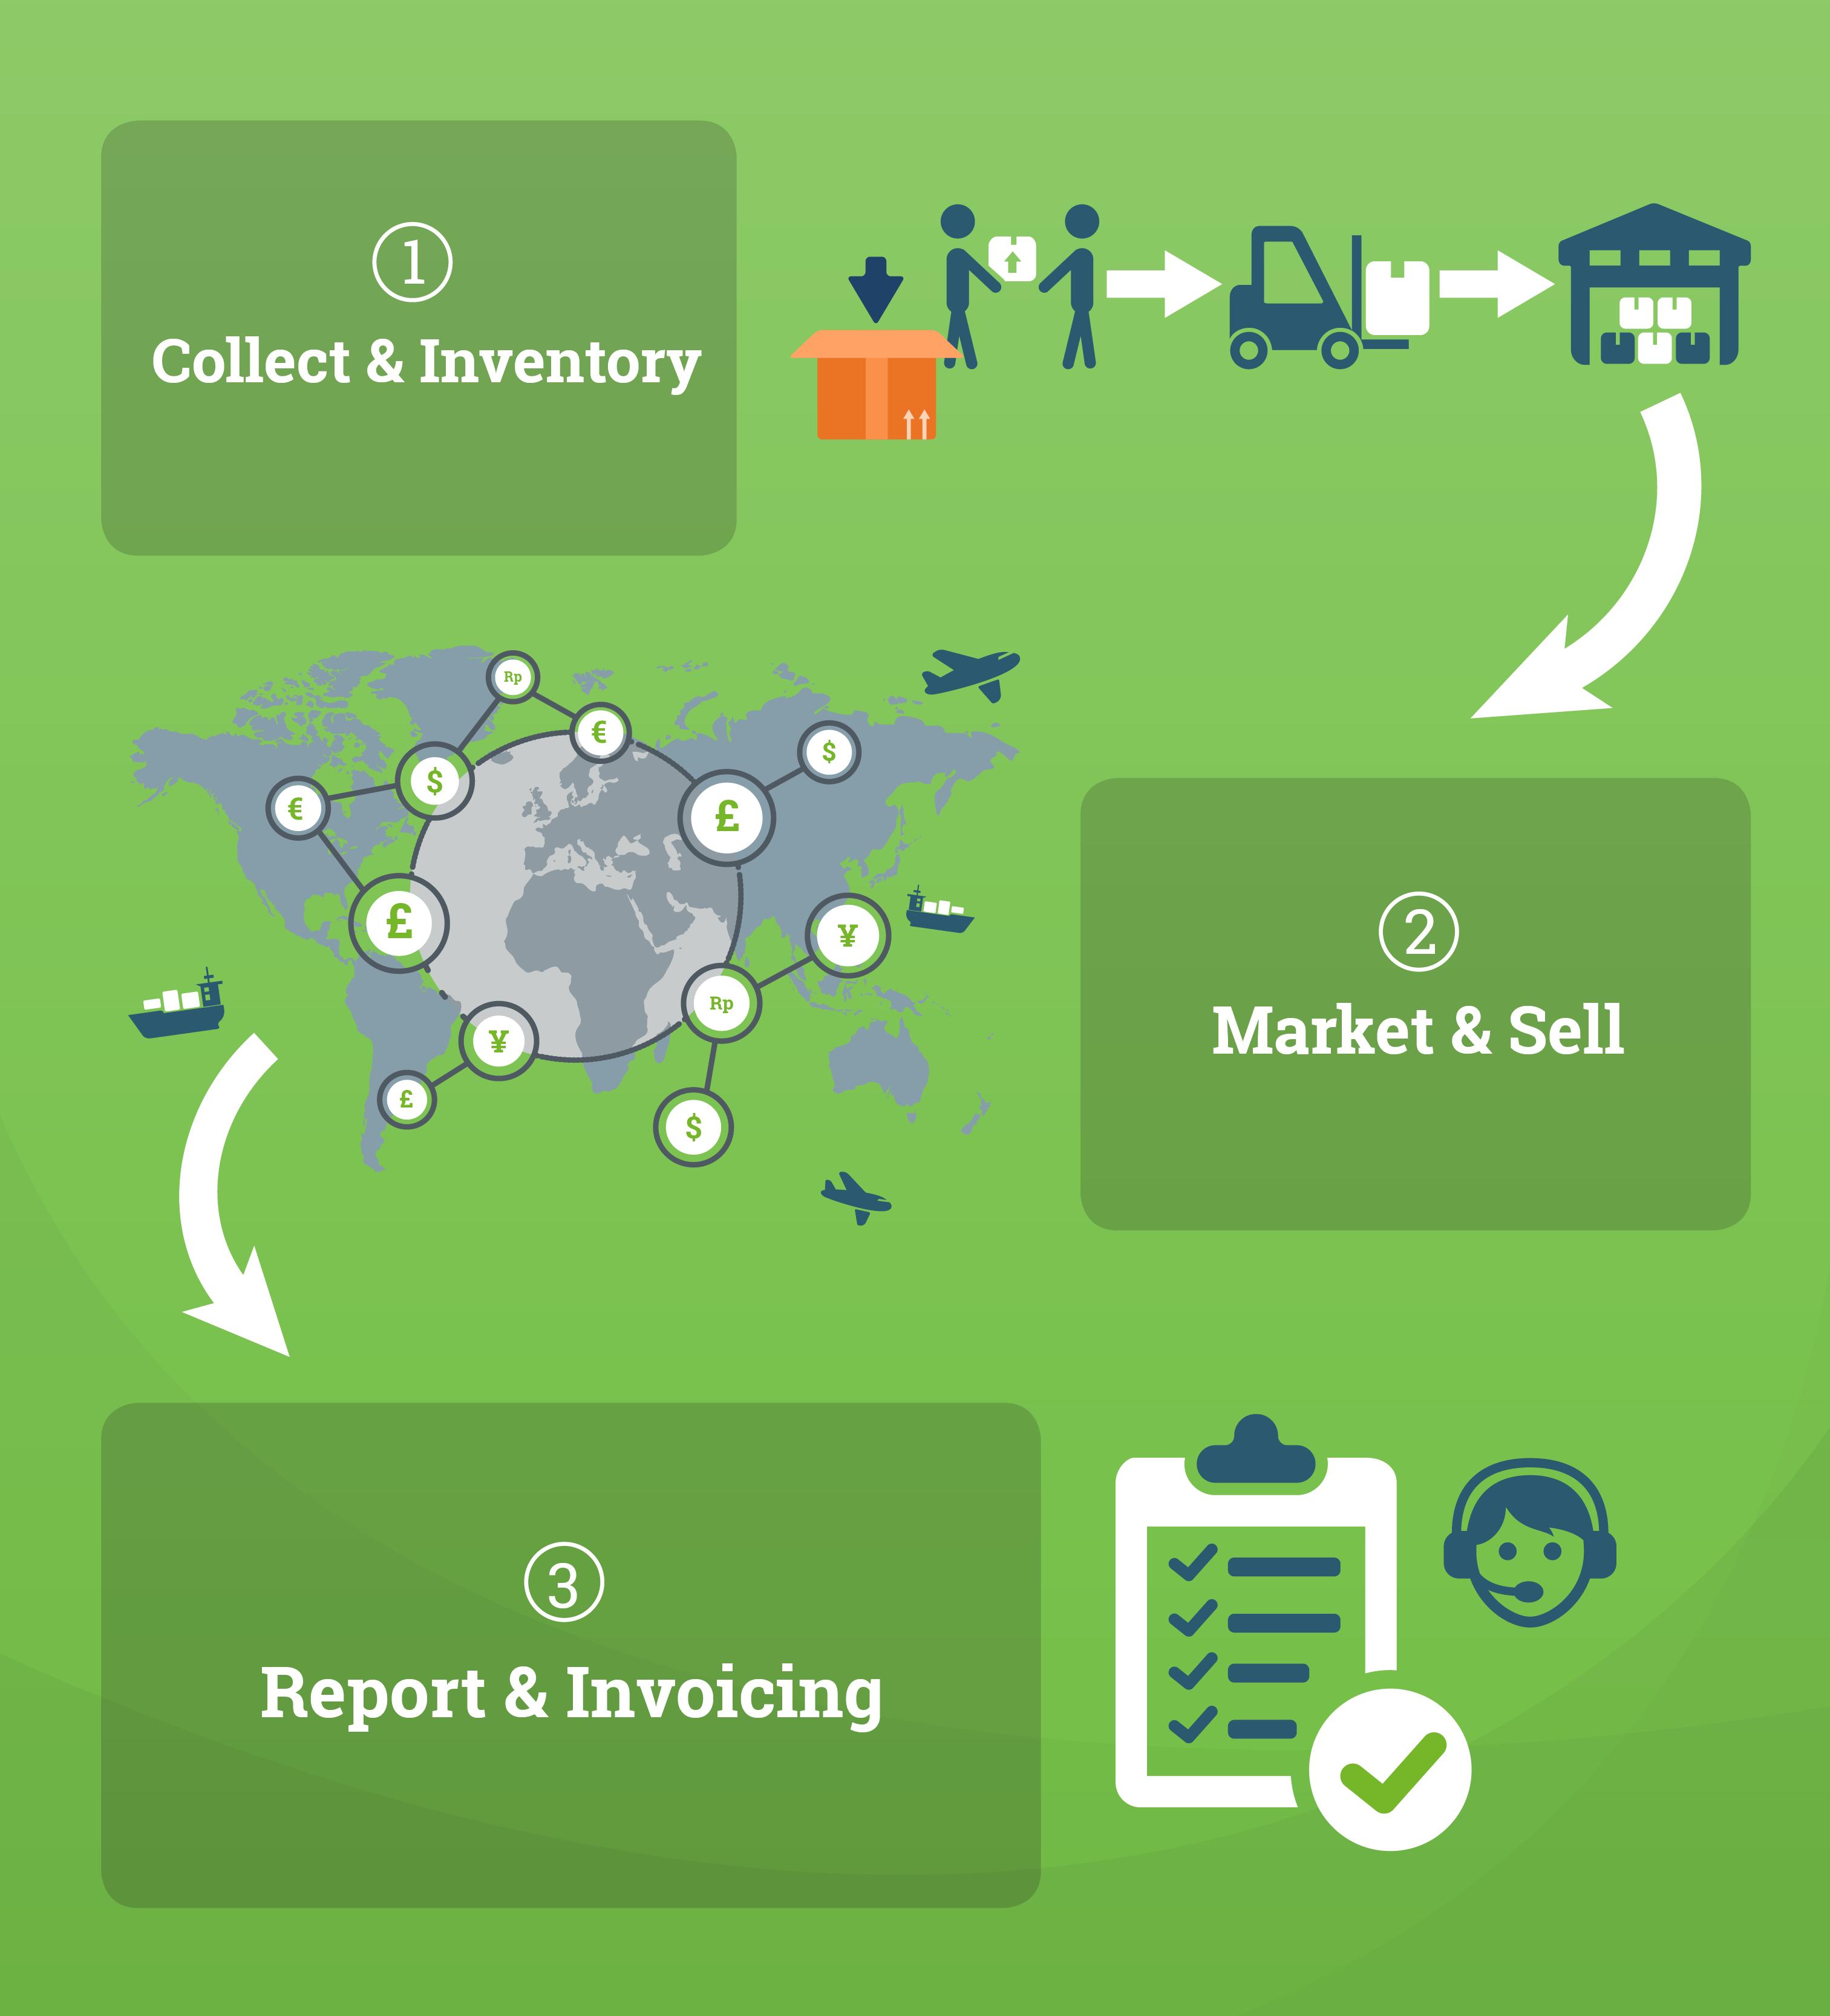 revenue-share-green-01